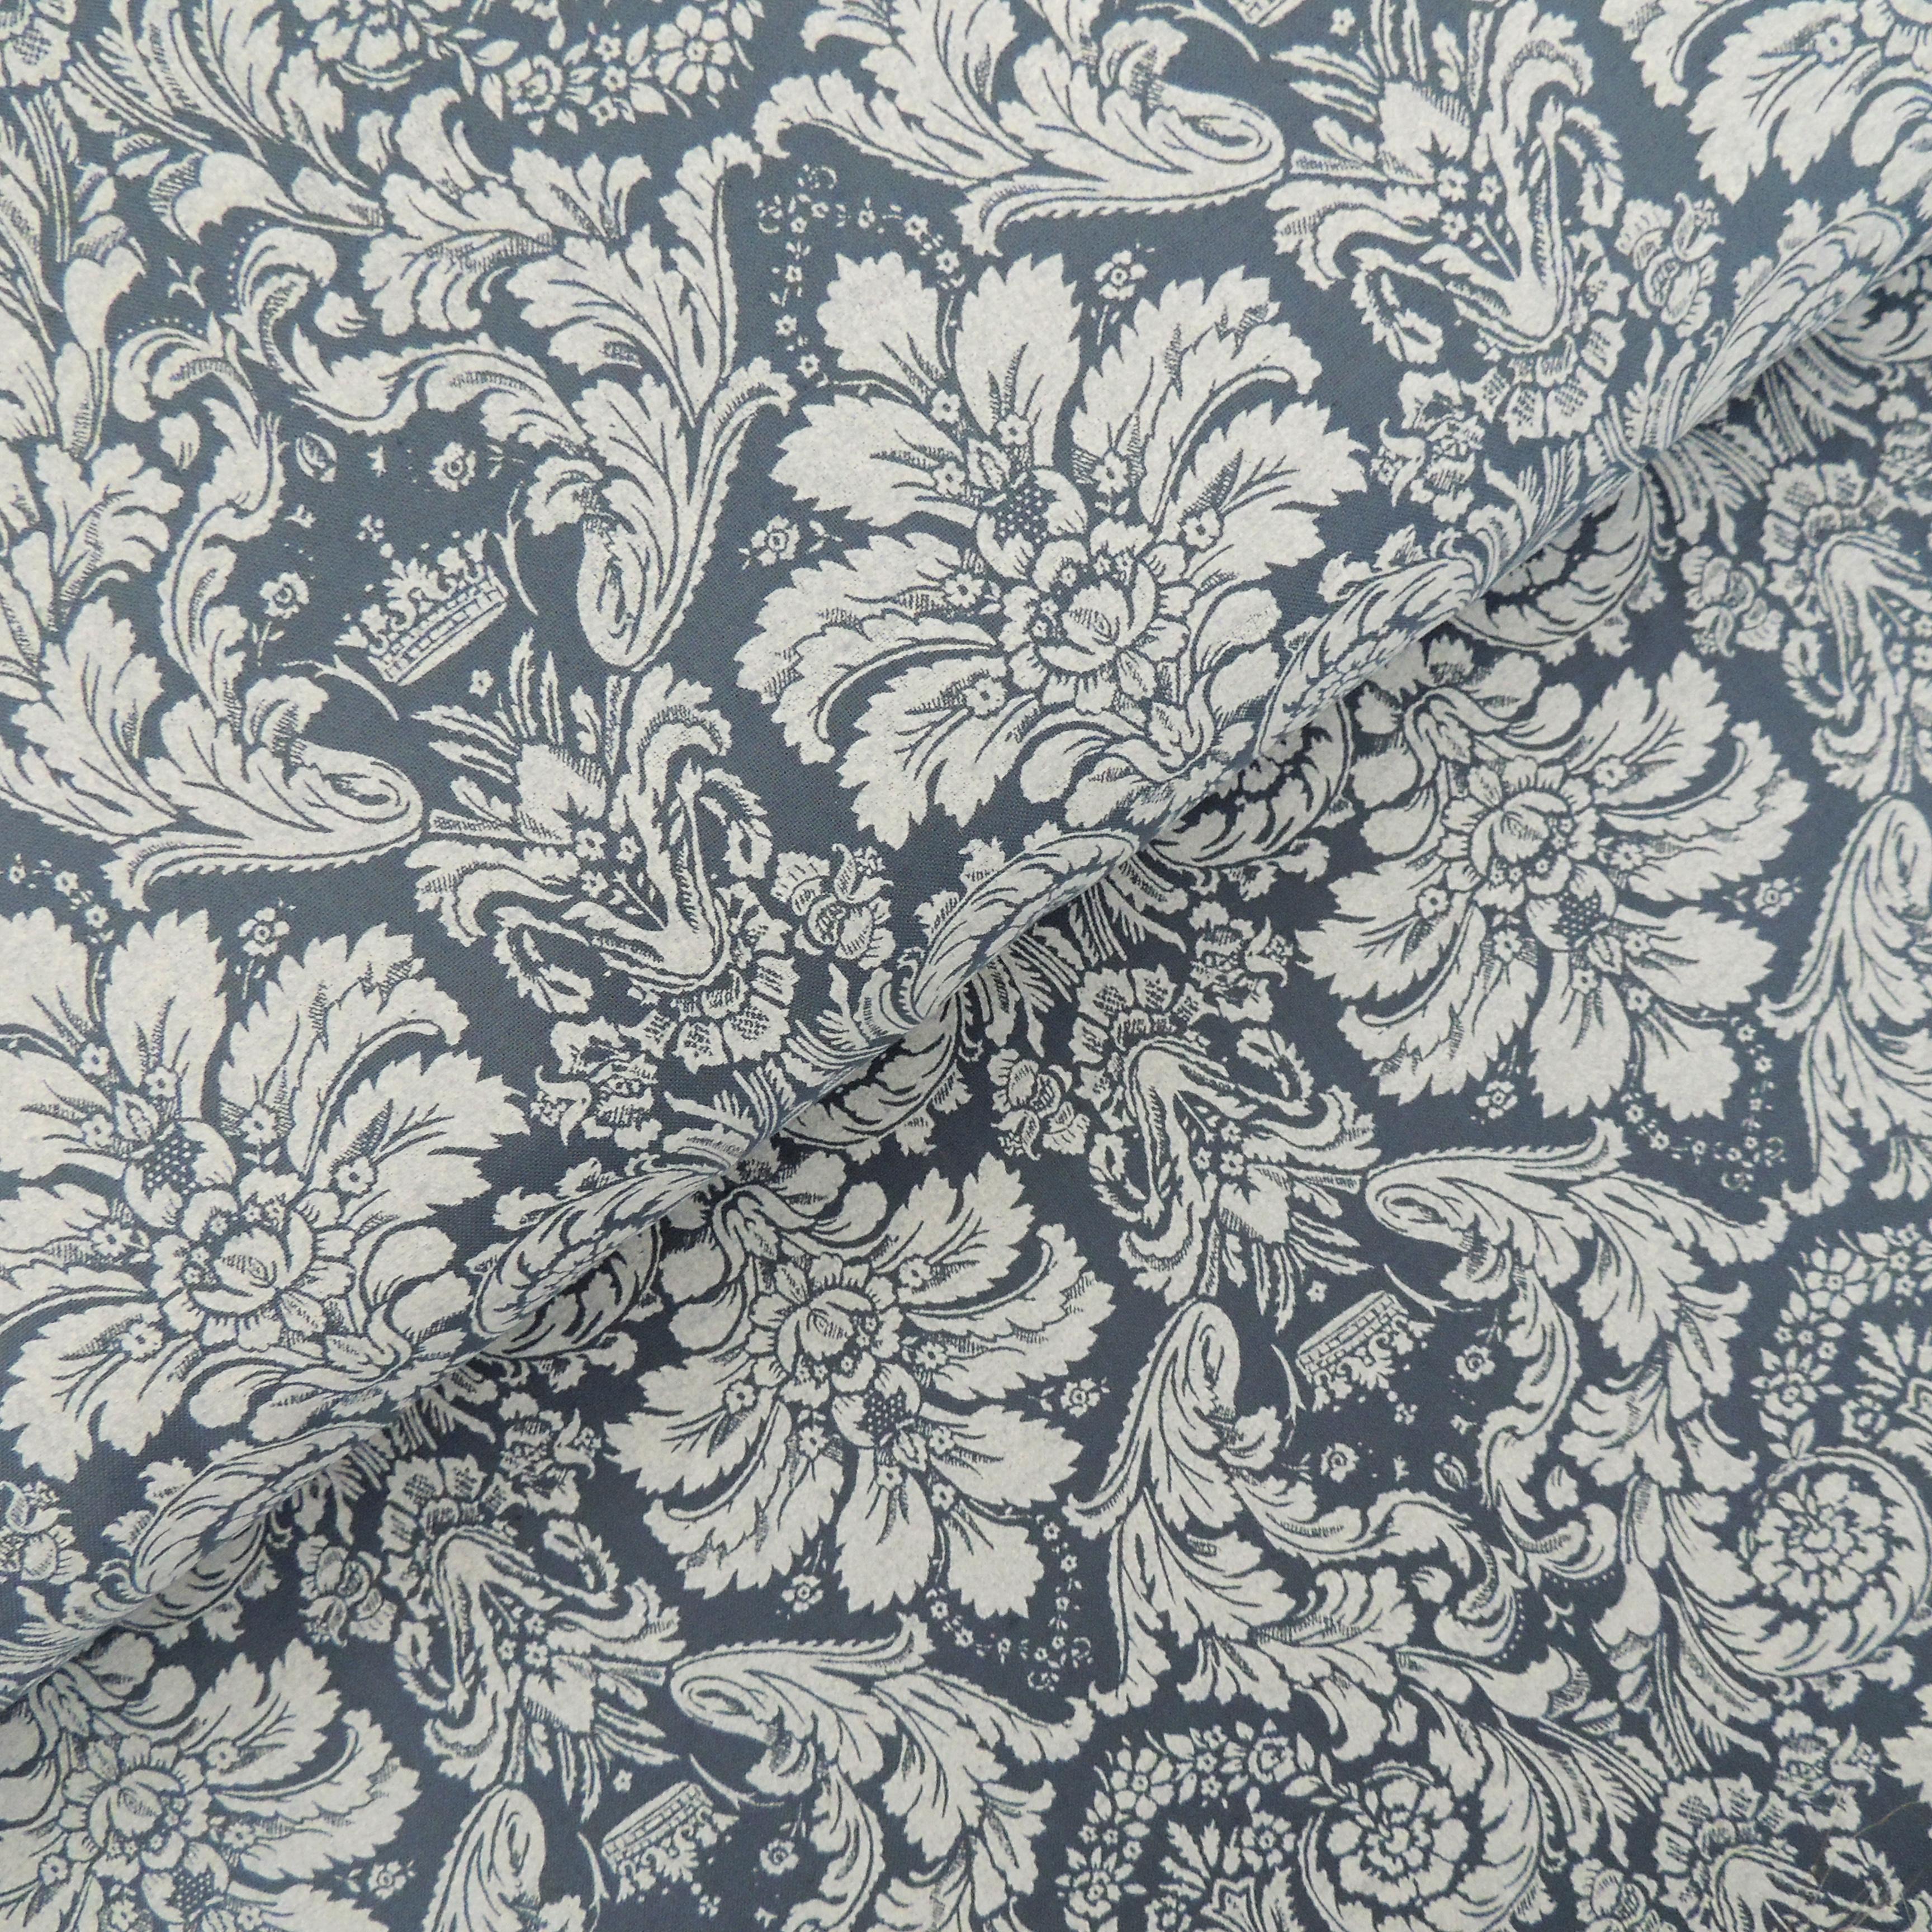 Ткань дамаск серый - студия SOVA